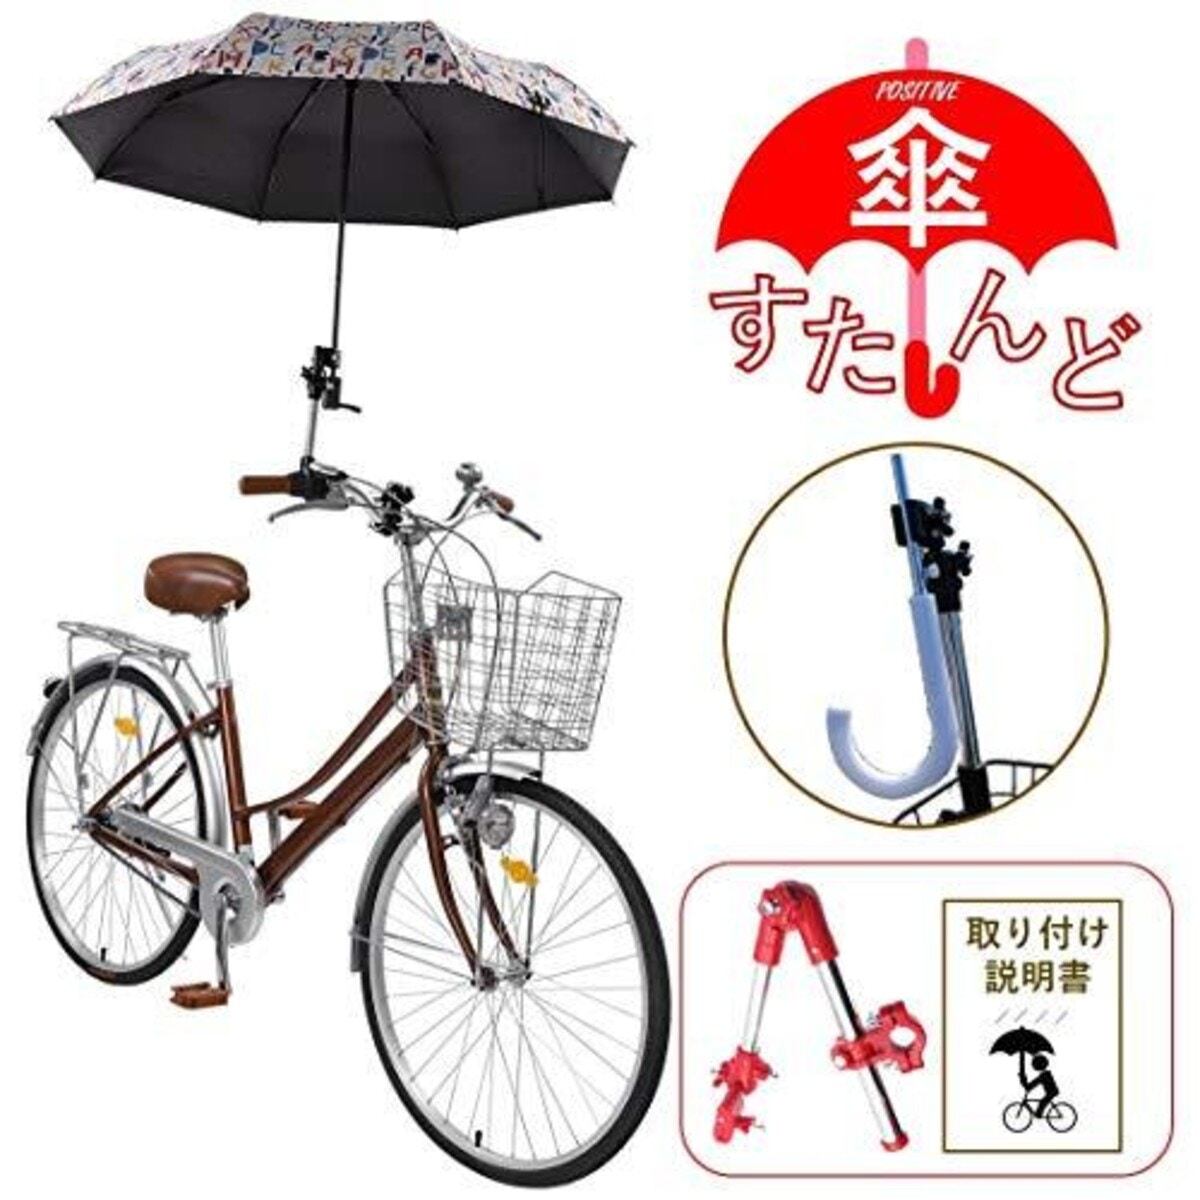 【 POSITIVE 】 傘スタンド 折りたたみタイプ